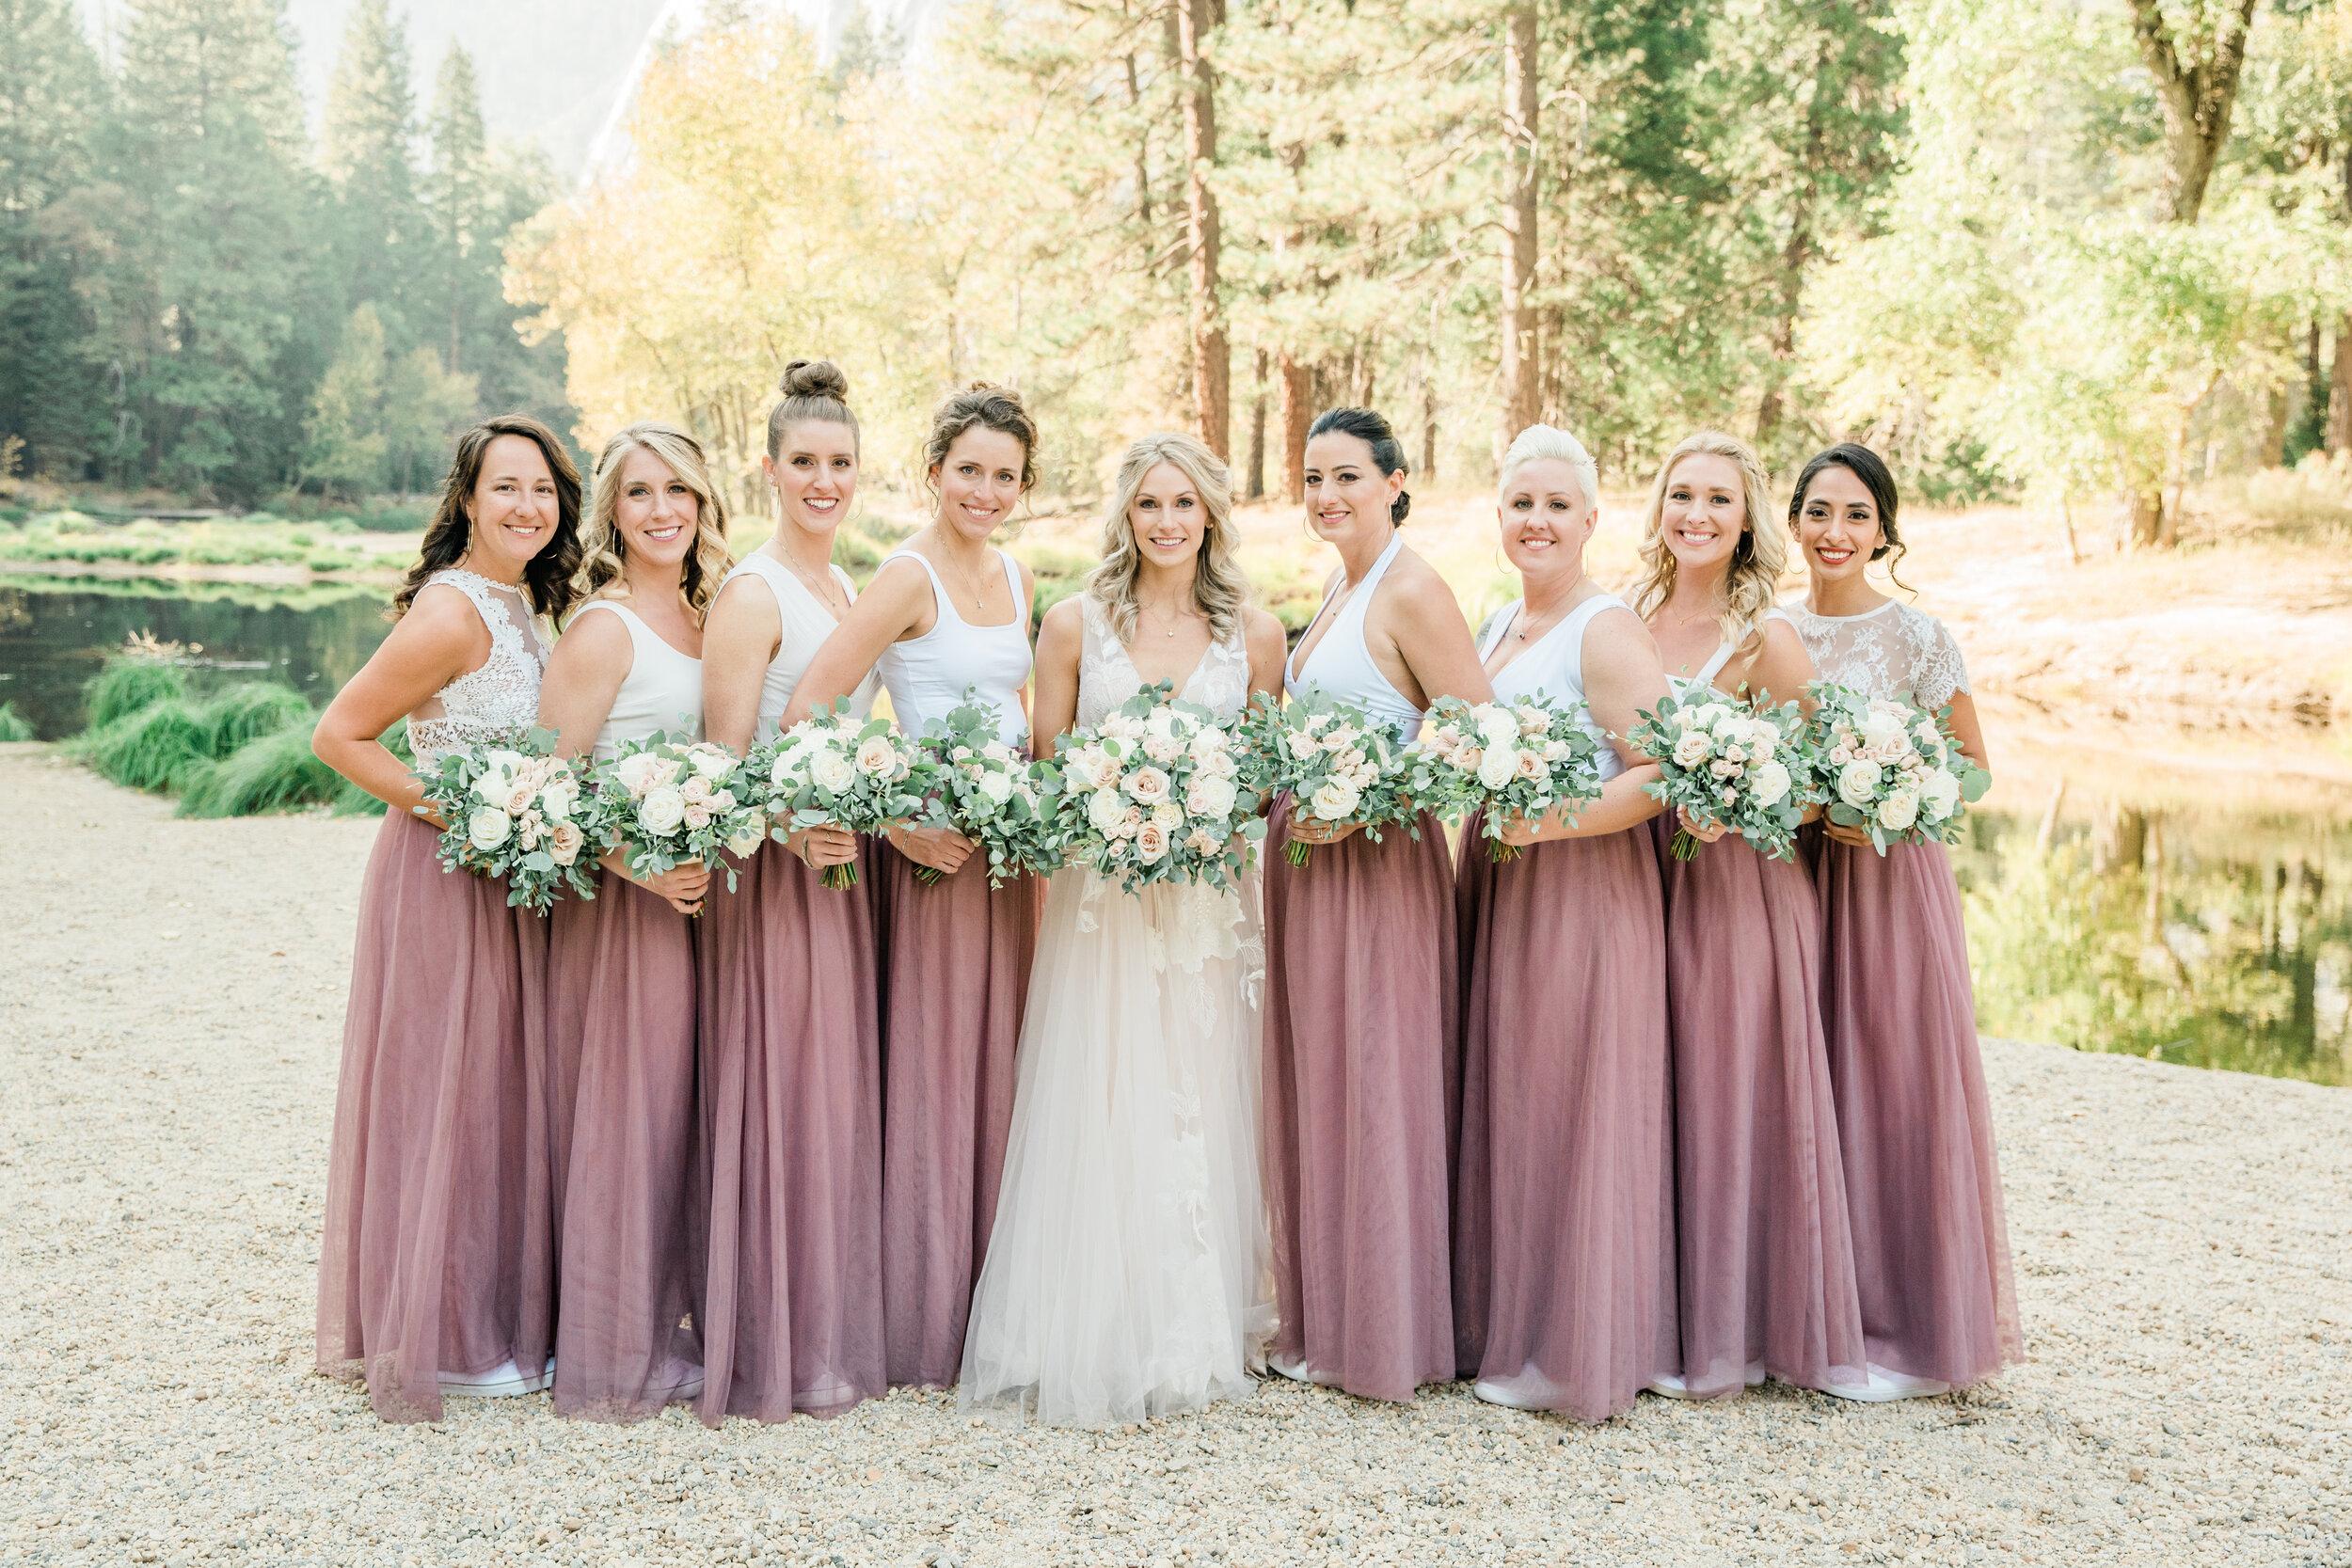 Leanne and Joe - Married - Sneak Peeks - Lauren Alisse Photography-22.jpg